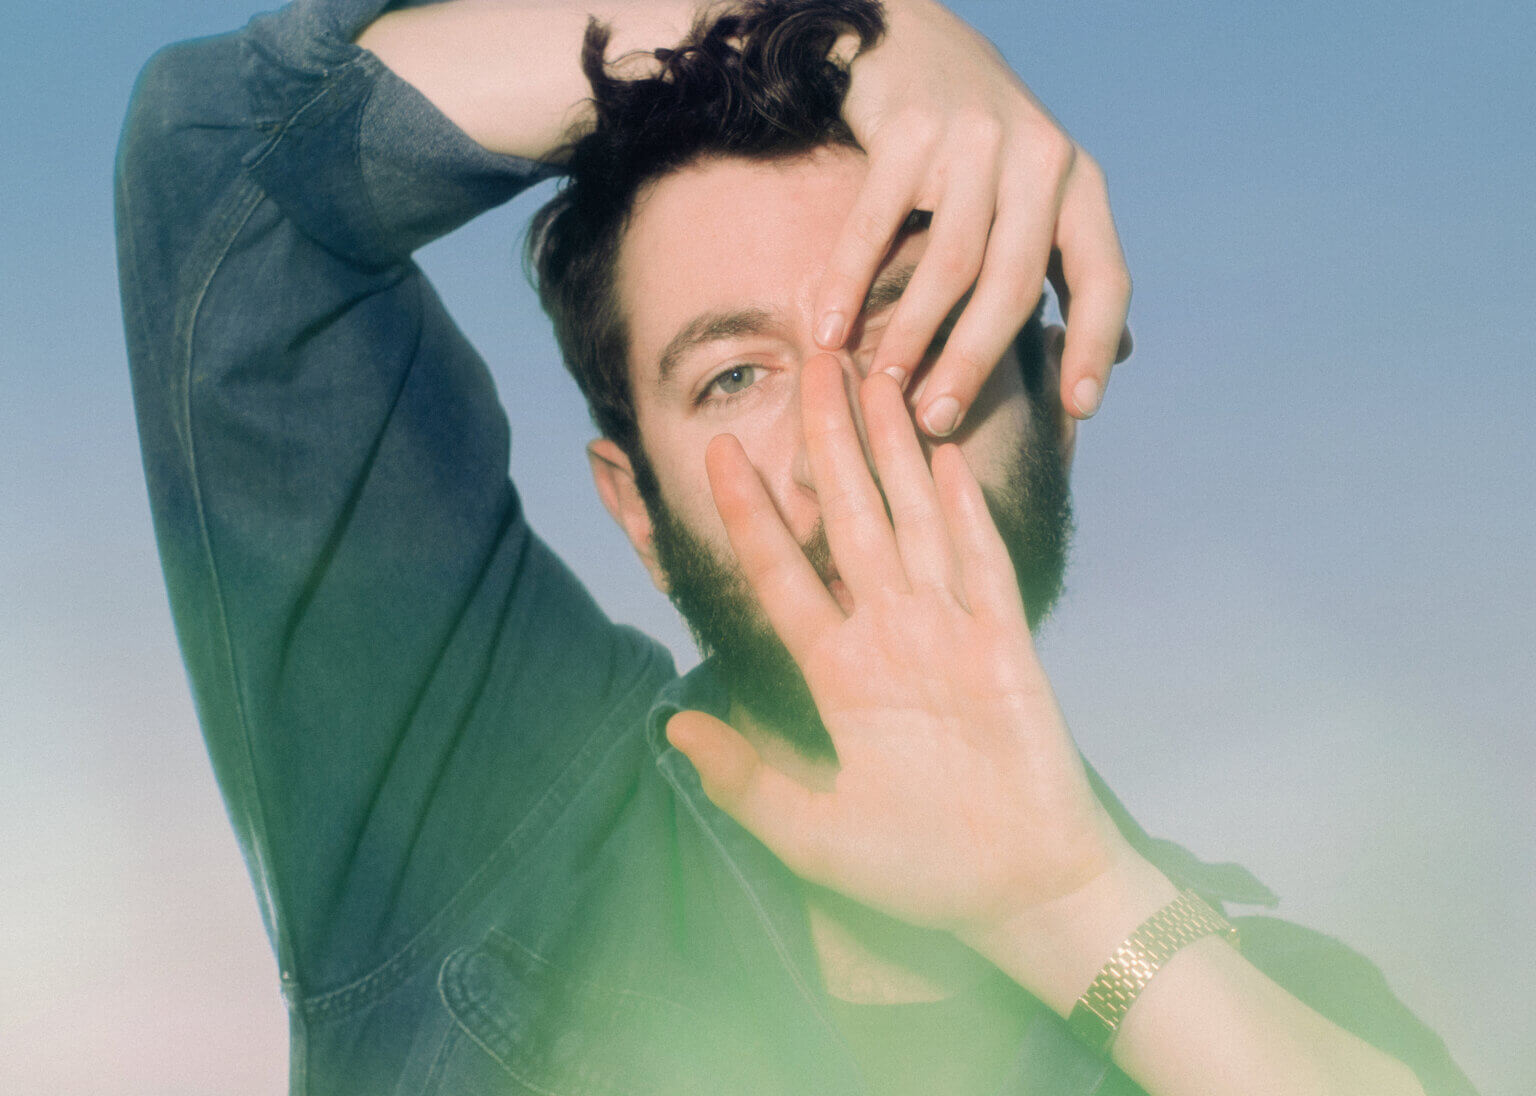 Chrome Sparks & Reo Cragun Announces New EP